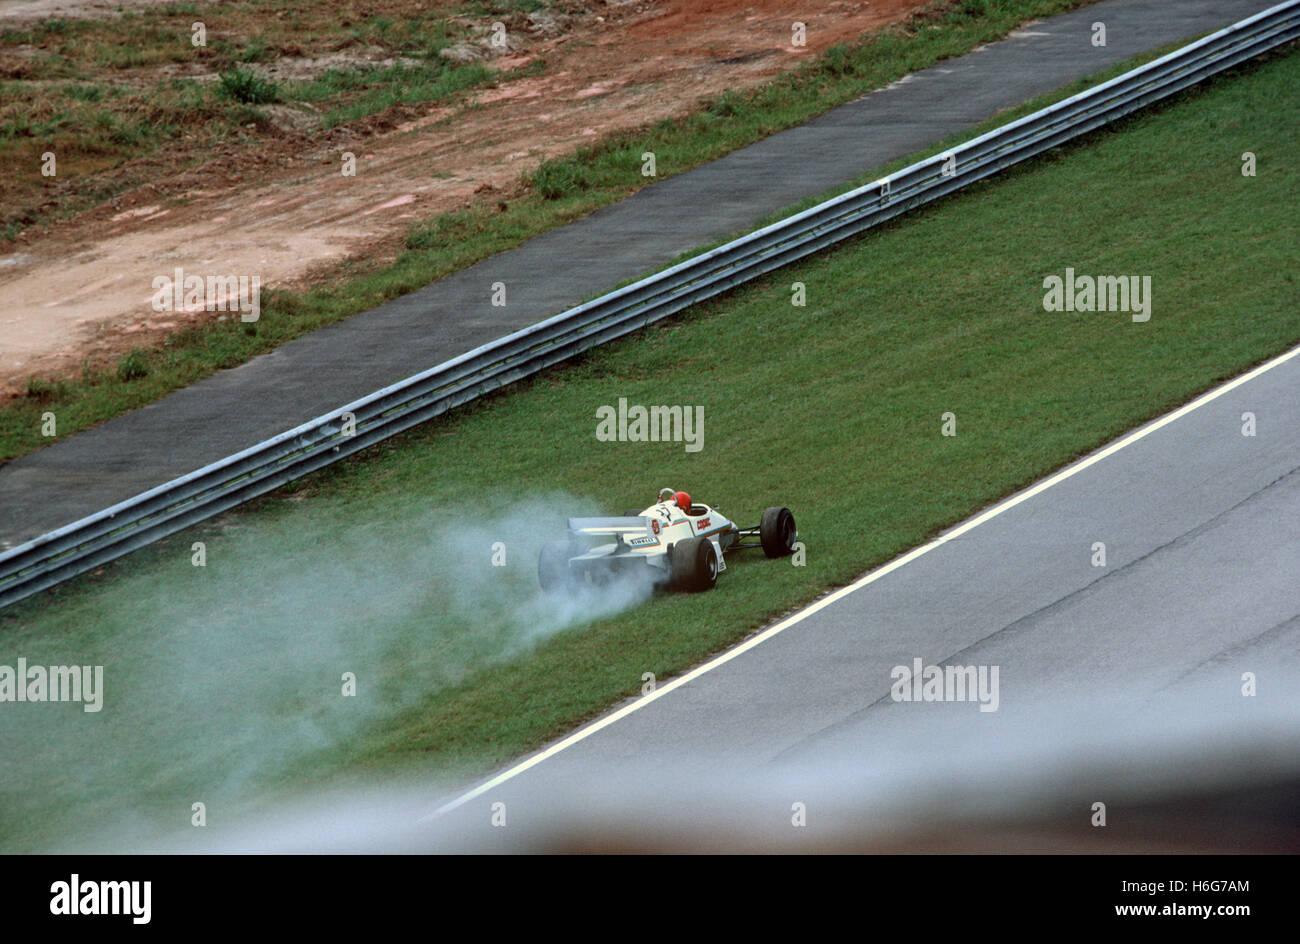 Smoking car pulls off track at the Jacarepagua circuit, Rio de Janeiro - home of the Formula 1 Brazilian Grand Prix - Stock Image